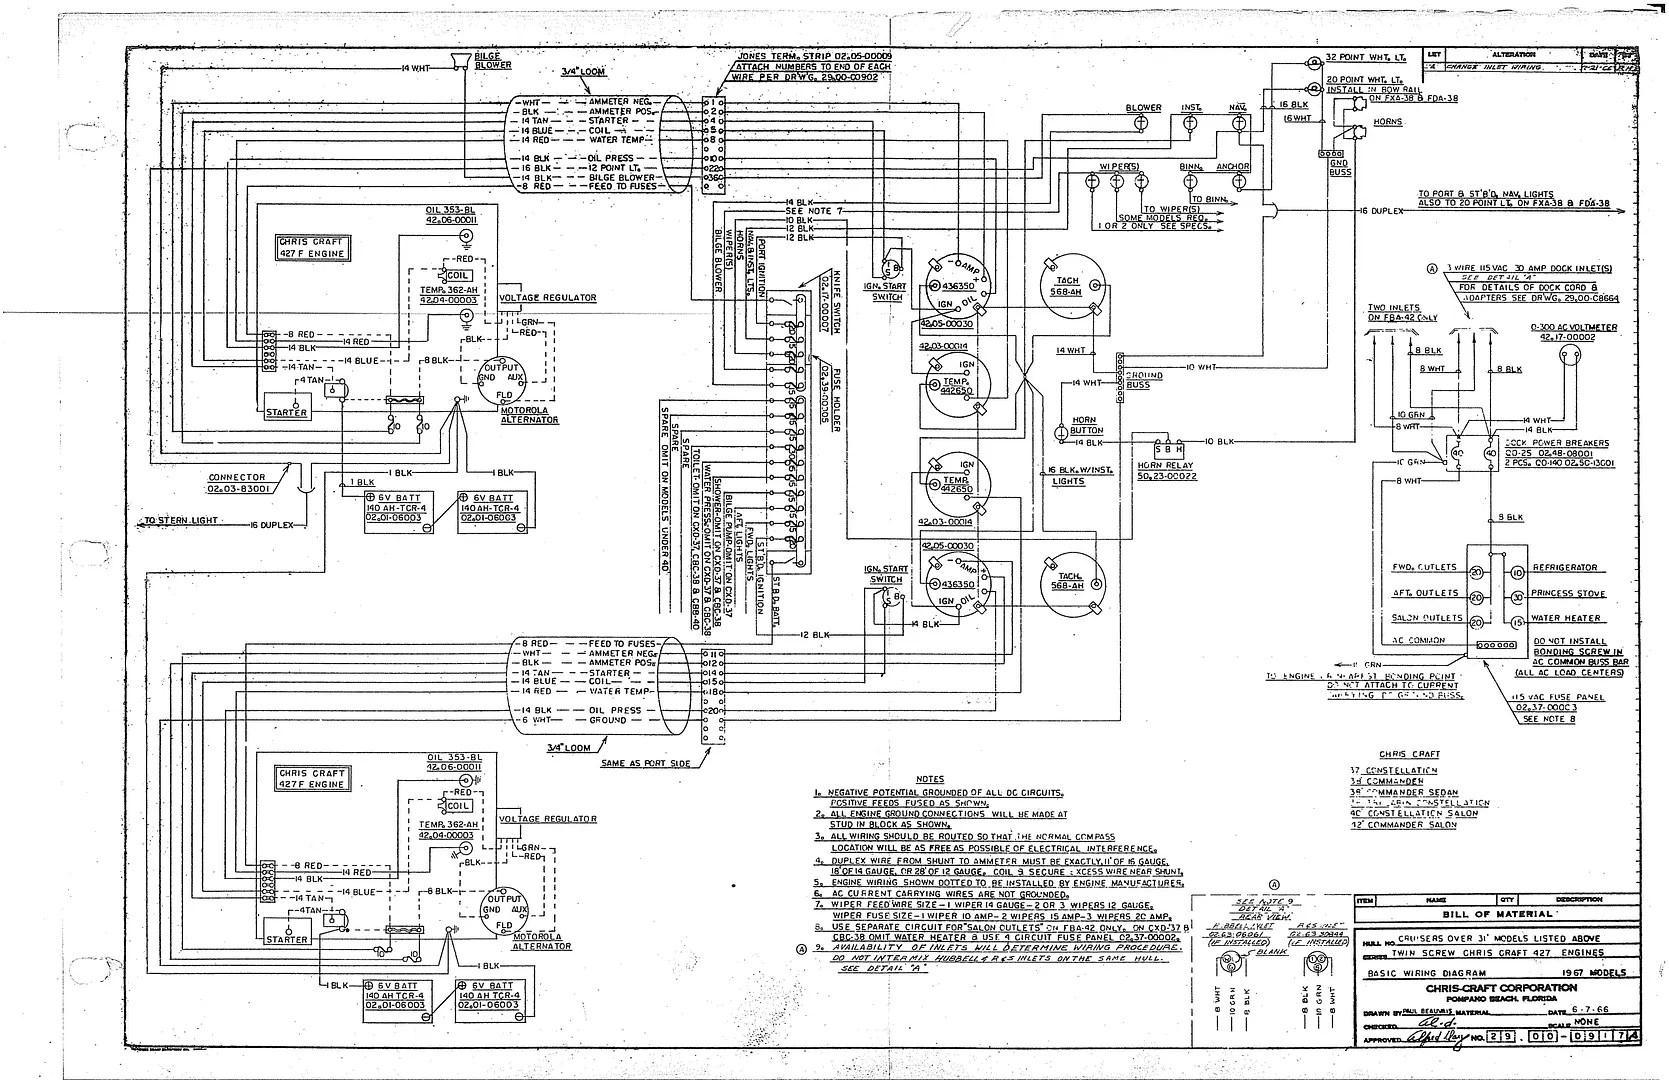 power commander 3 wiring diagram 67 mustang v hayabusa get free image